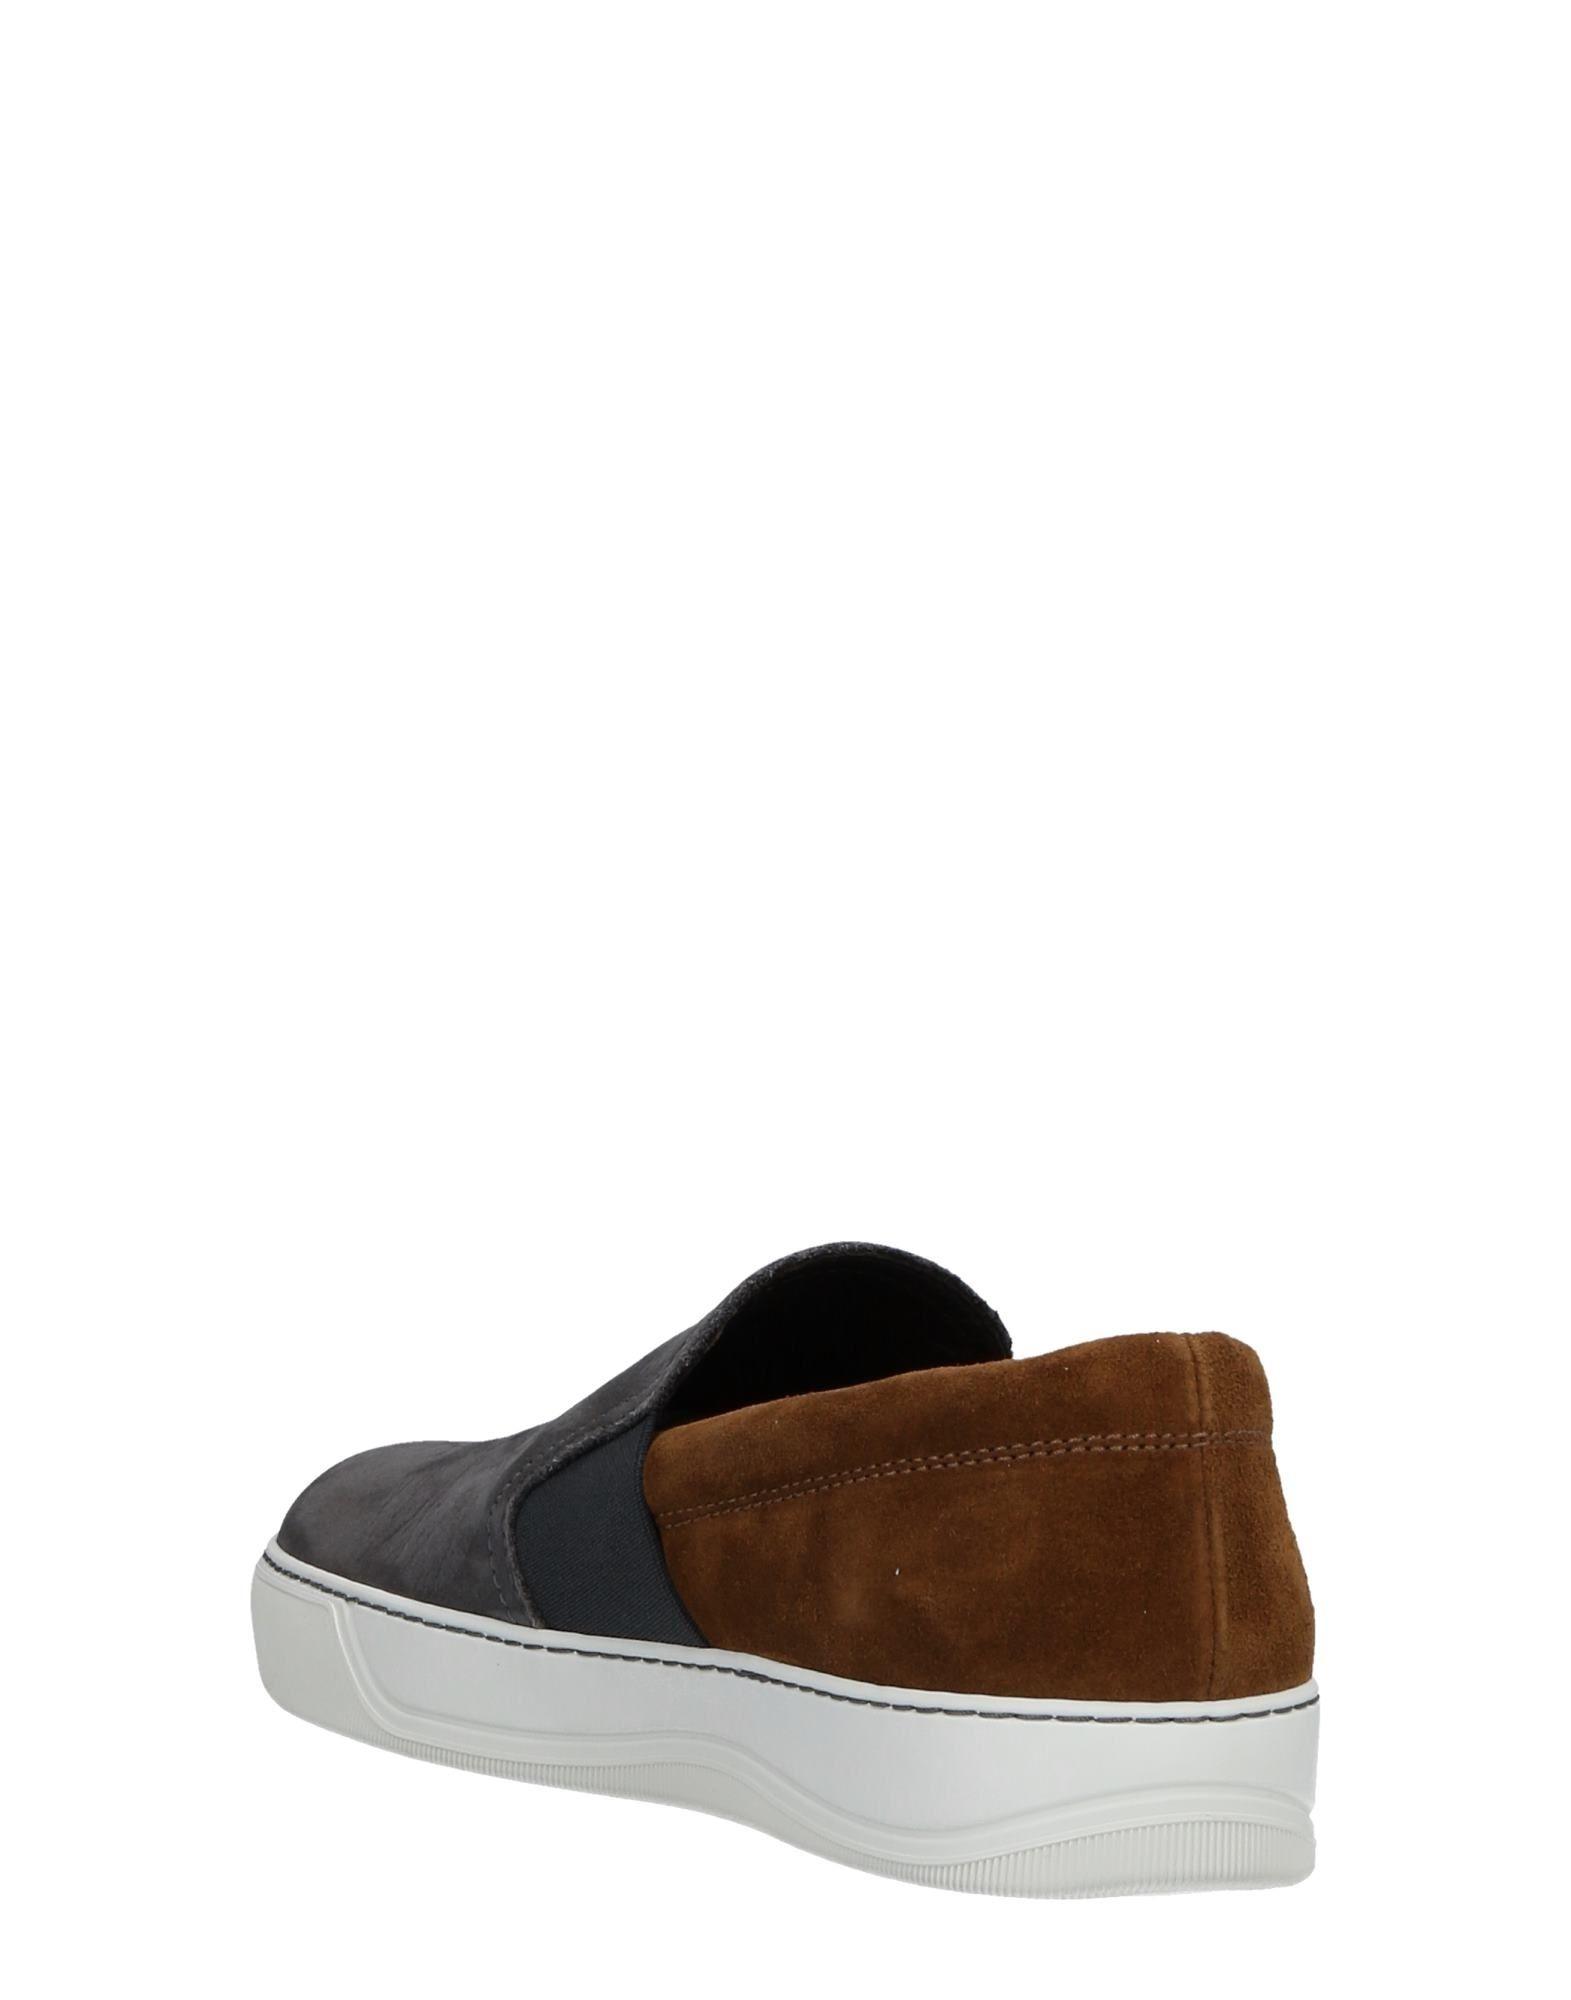 Lanvin Sneakers Herren  11514139LG Heiße Schuhe Schuhe Schuhe 12ffd4